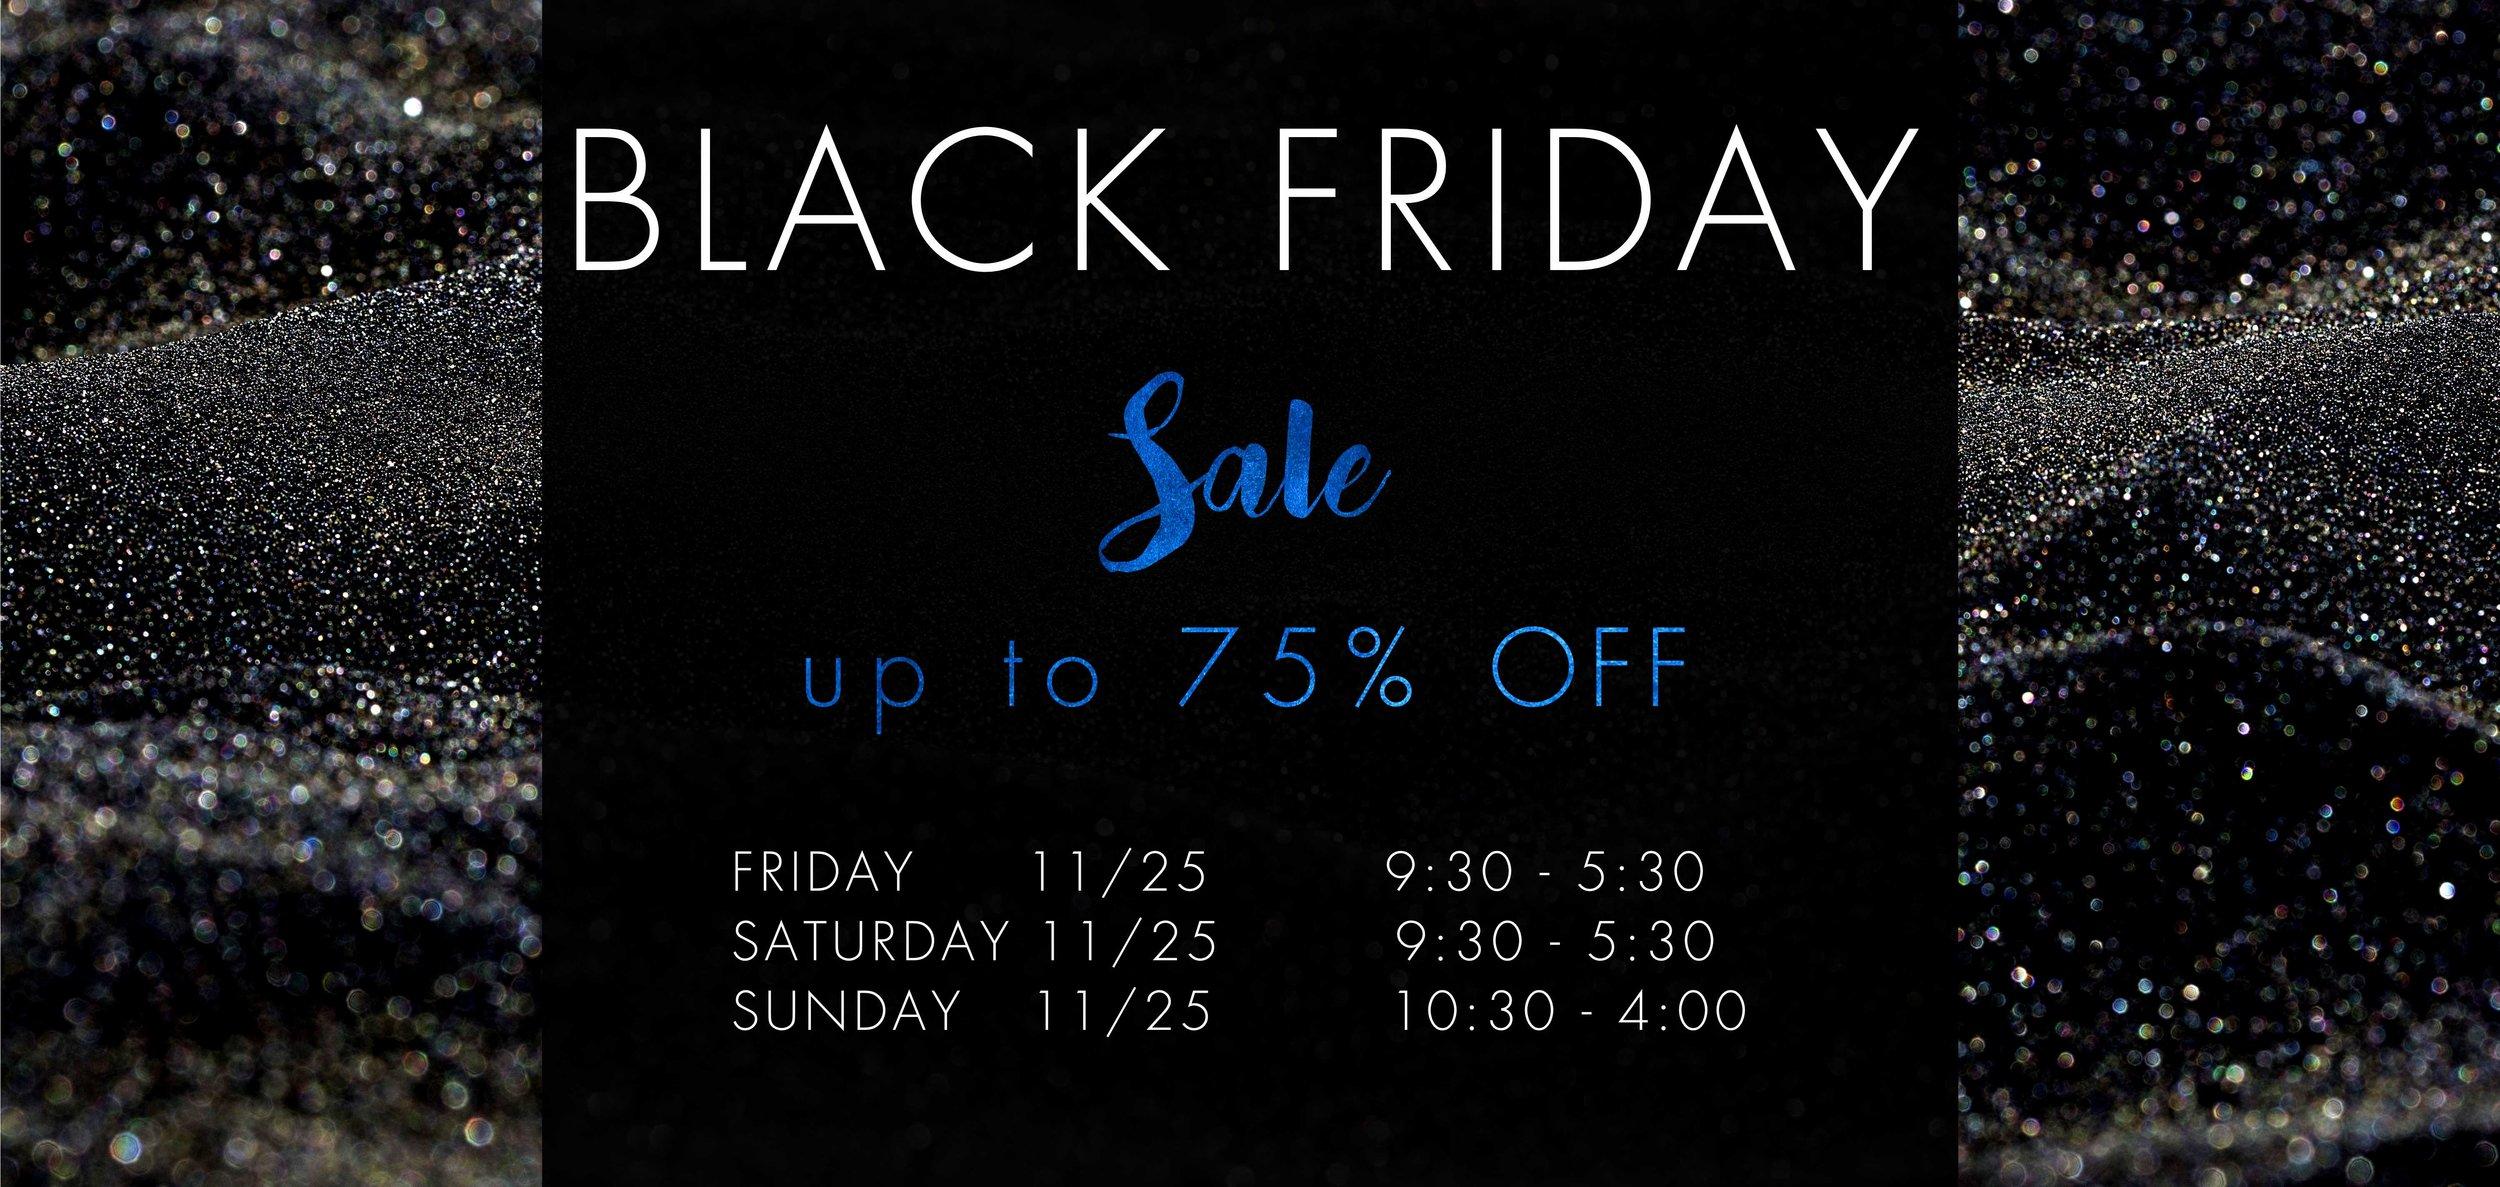 Black Friday Sale hula Moon Boutique 2016 Web banner.jpg